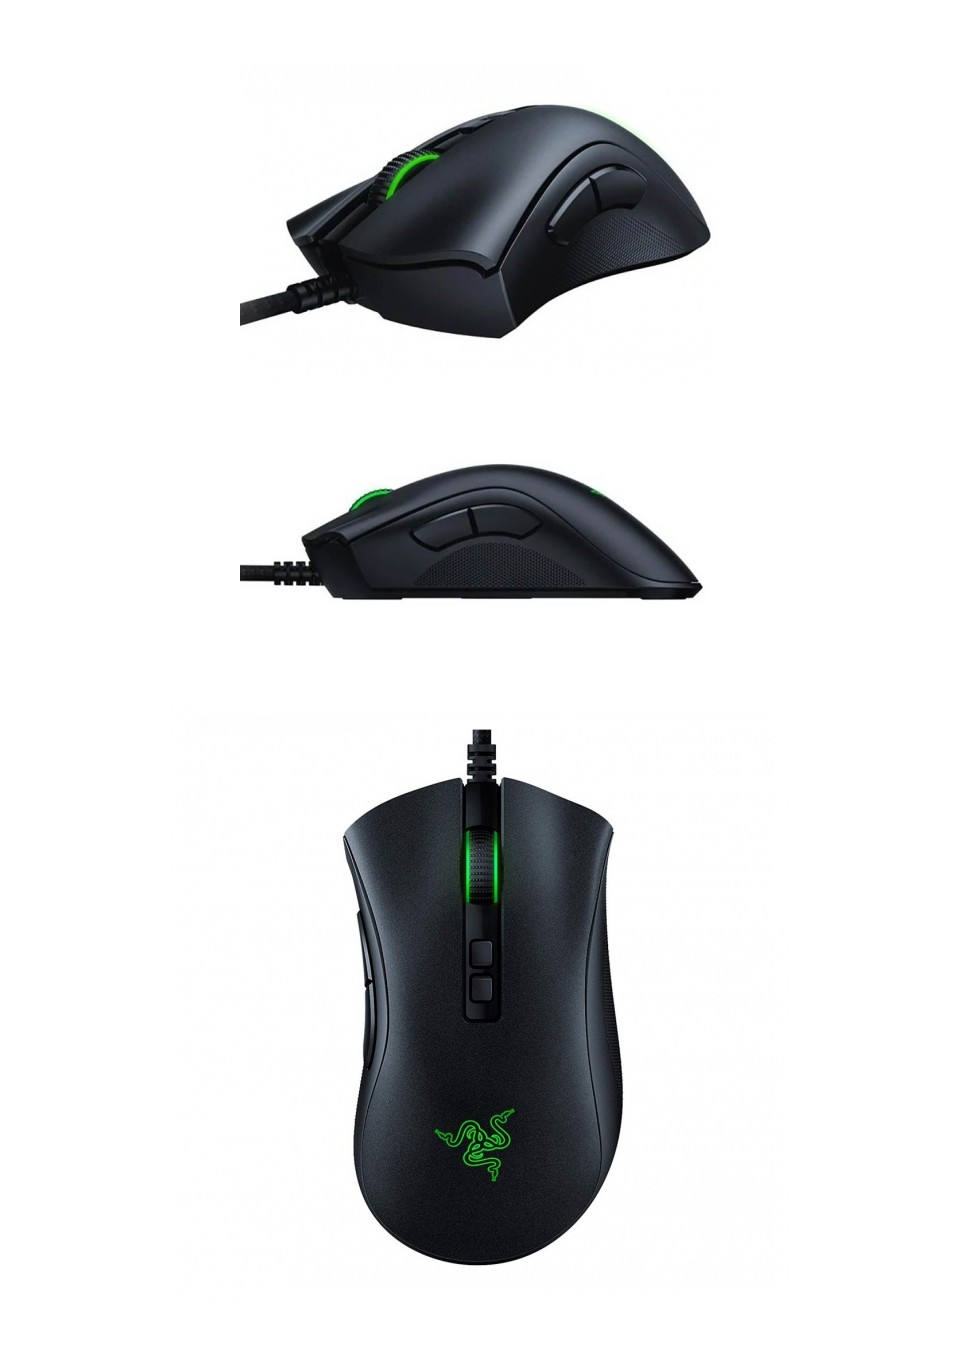 Razer DeathAdder V2 Optical Gaming Mouse product